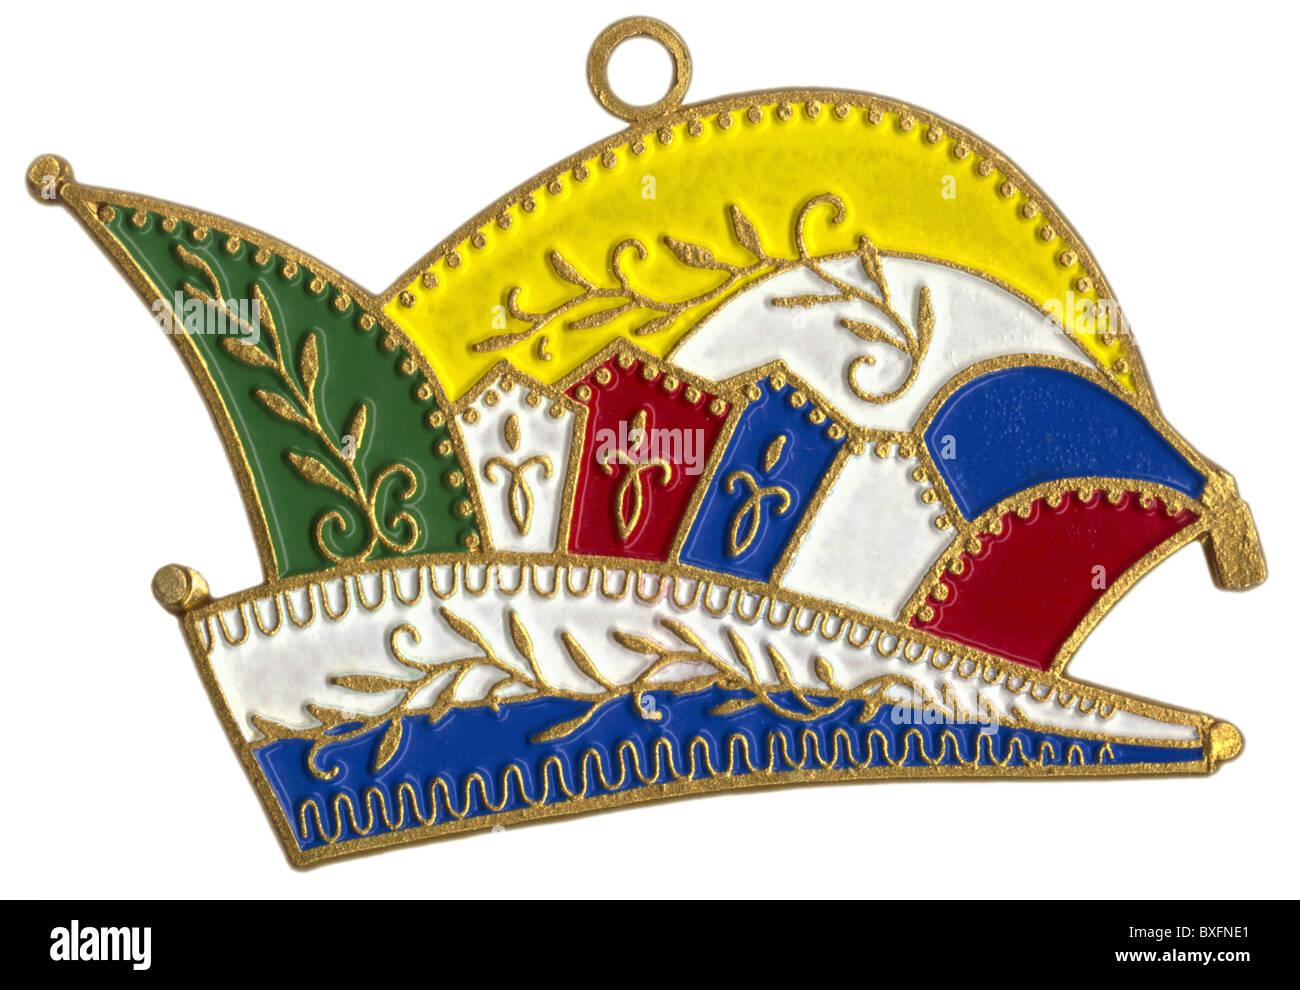 carnival, duncecap, prince cap, enamel stick, 1980s, 80s, 20th century, historic, historical, Shrove Tuesday, symbol, - Stock Image